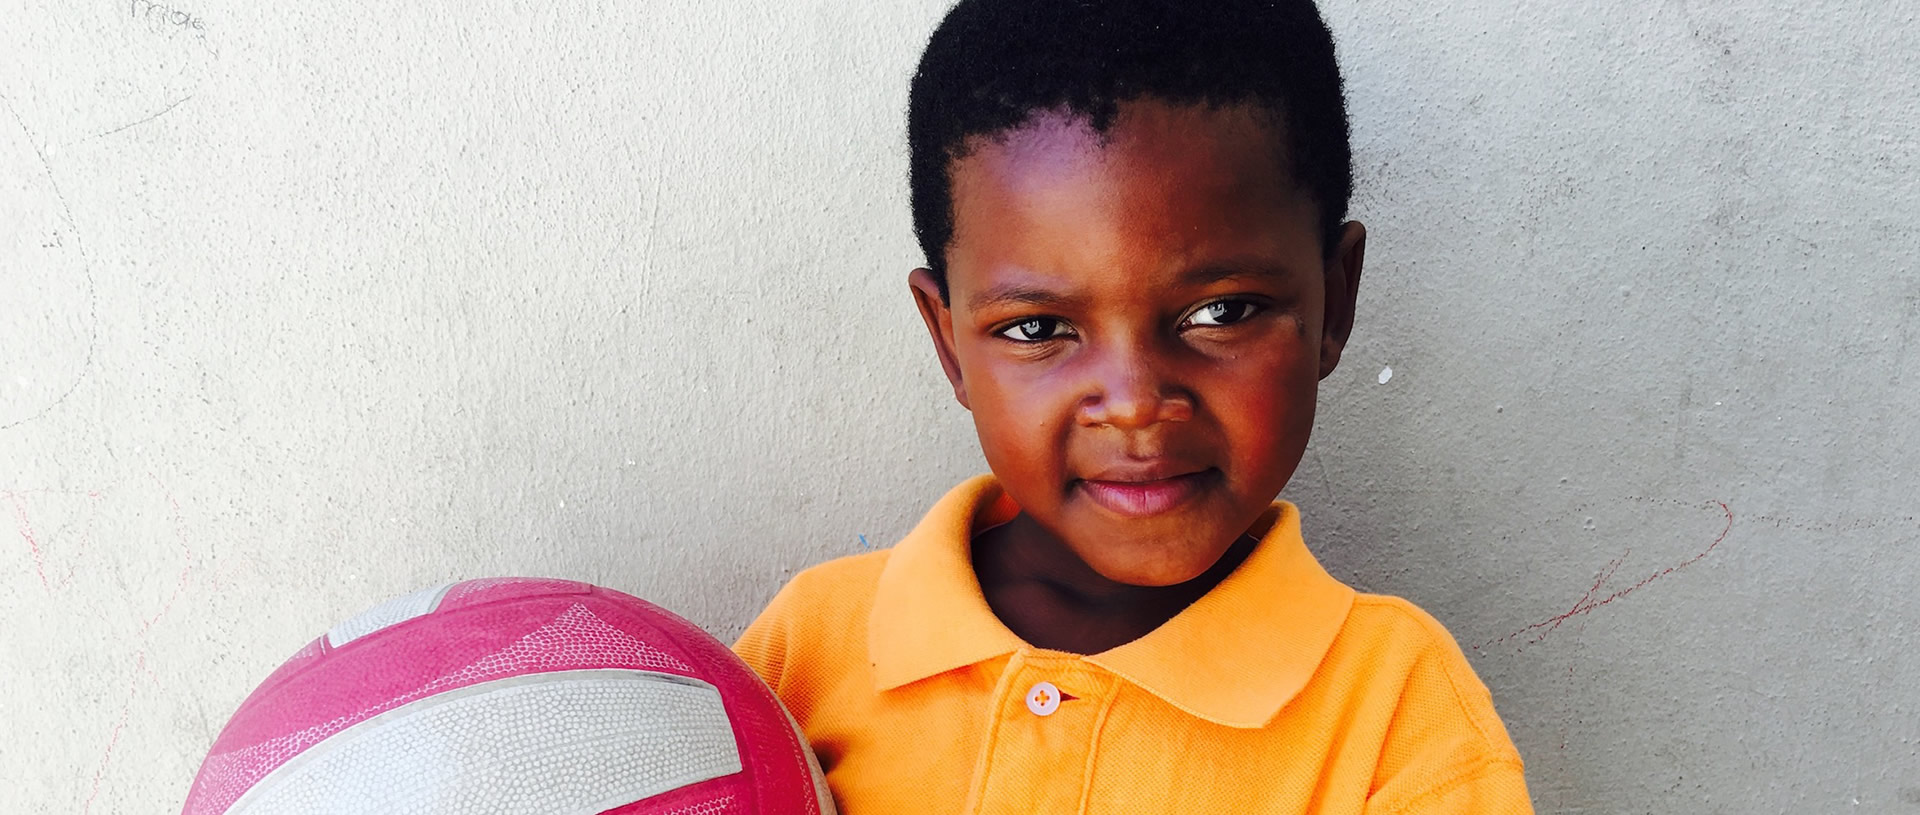 Lelomso's family learns to trust God banner